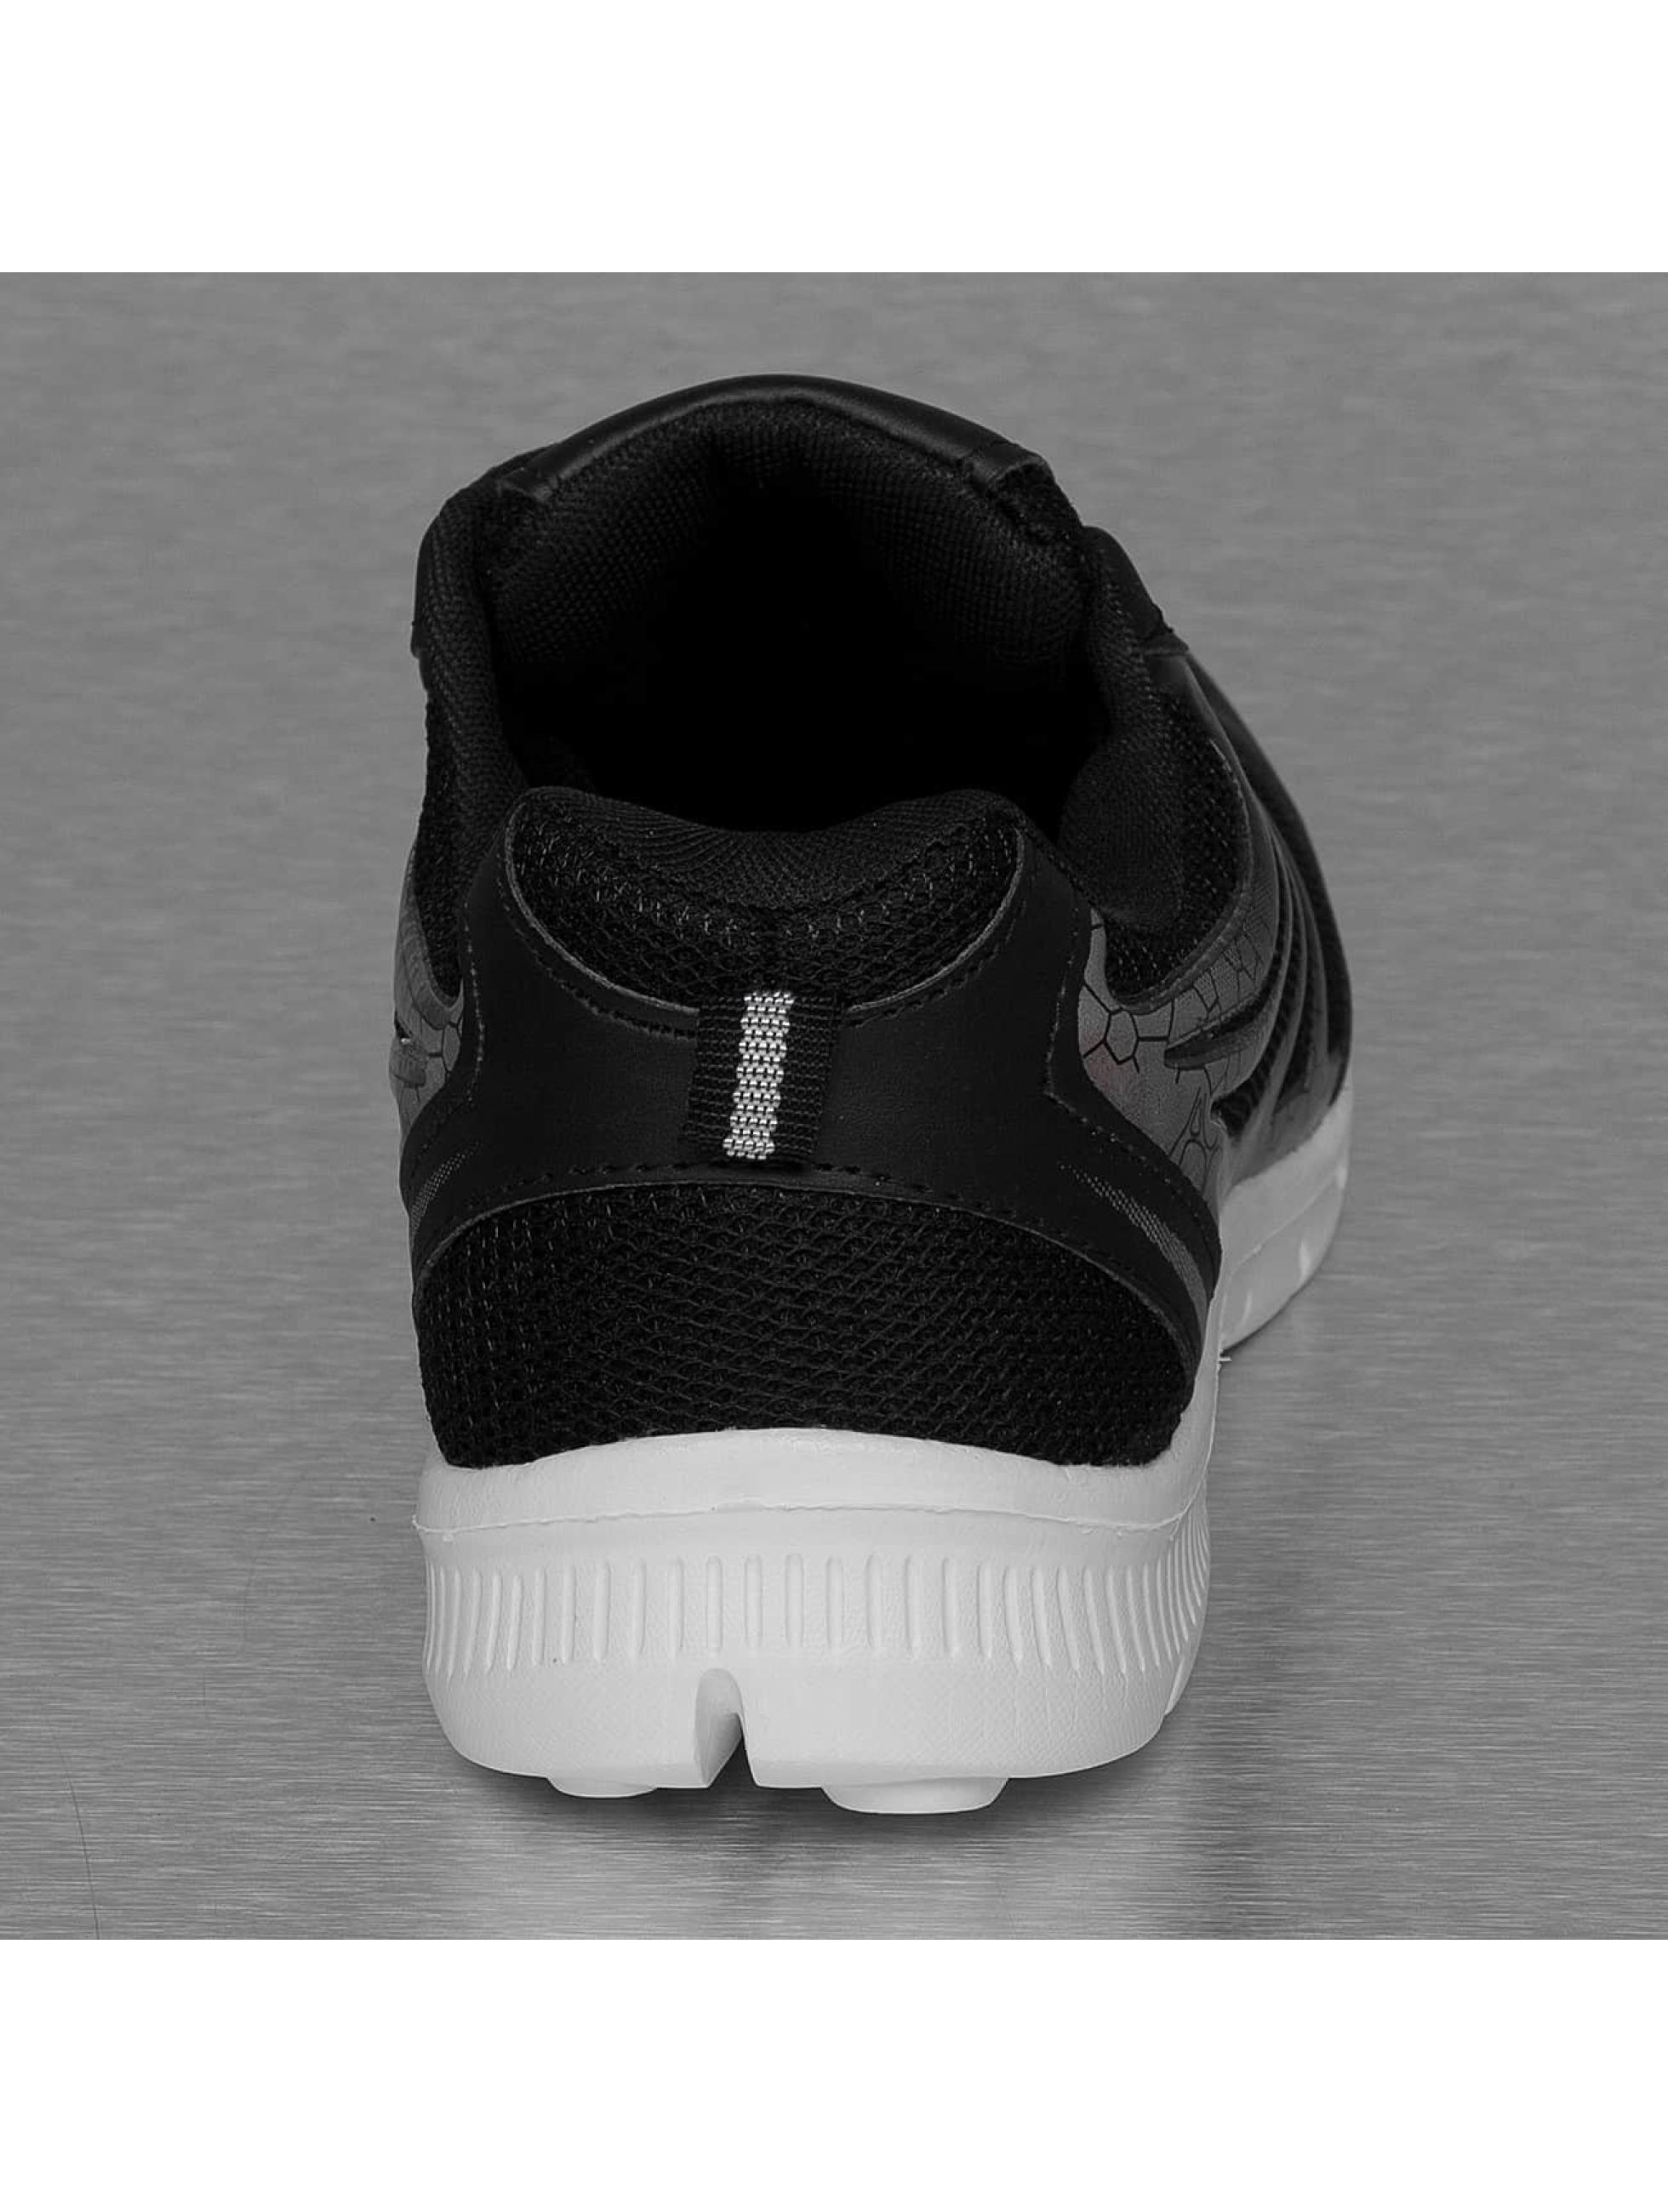 New York Style Sneakers D.T. czarny